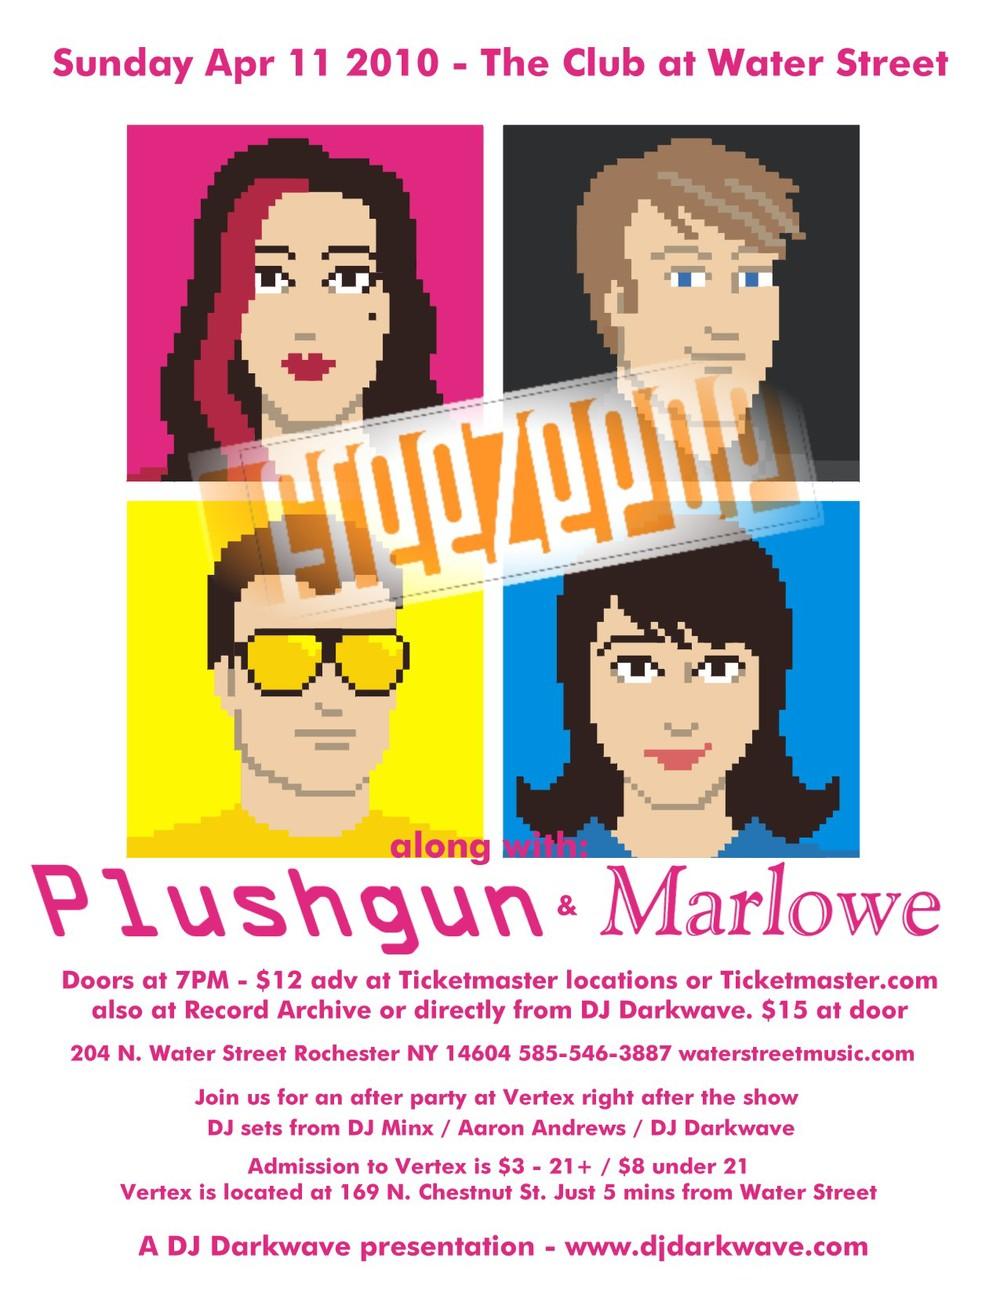 Freezepop-Plushgun-Marlowe.jpg